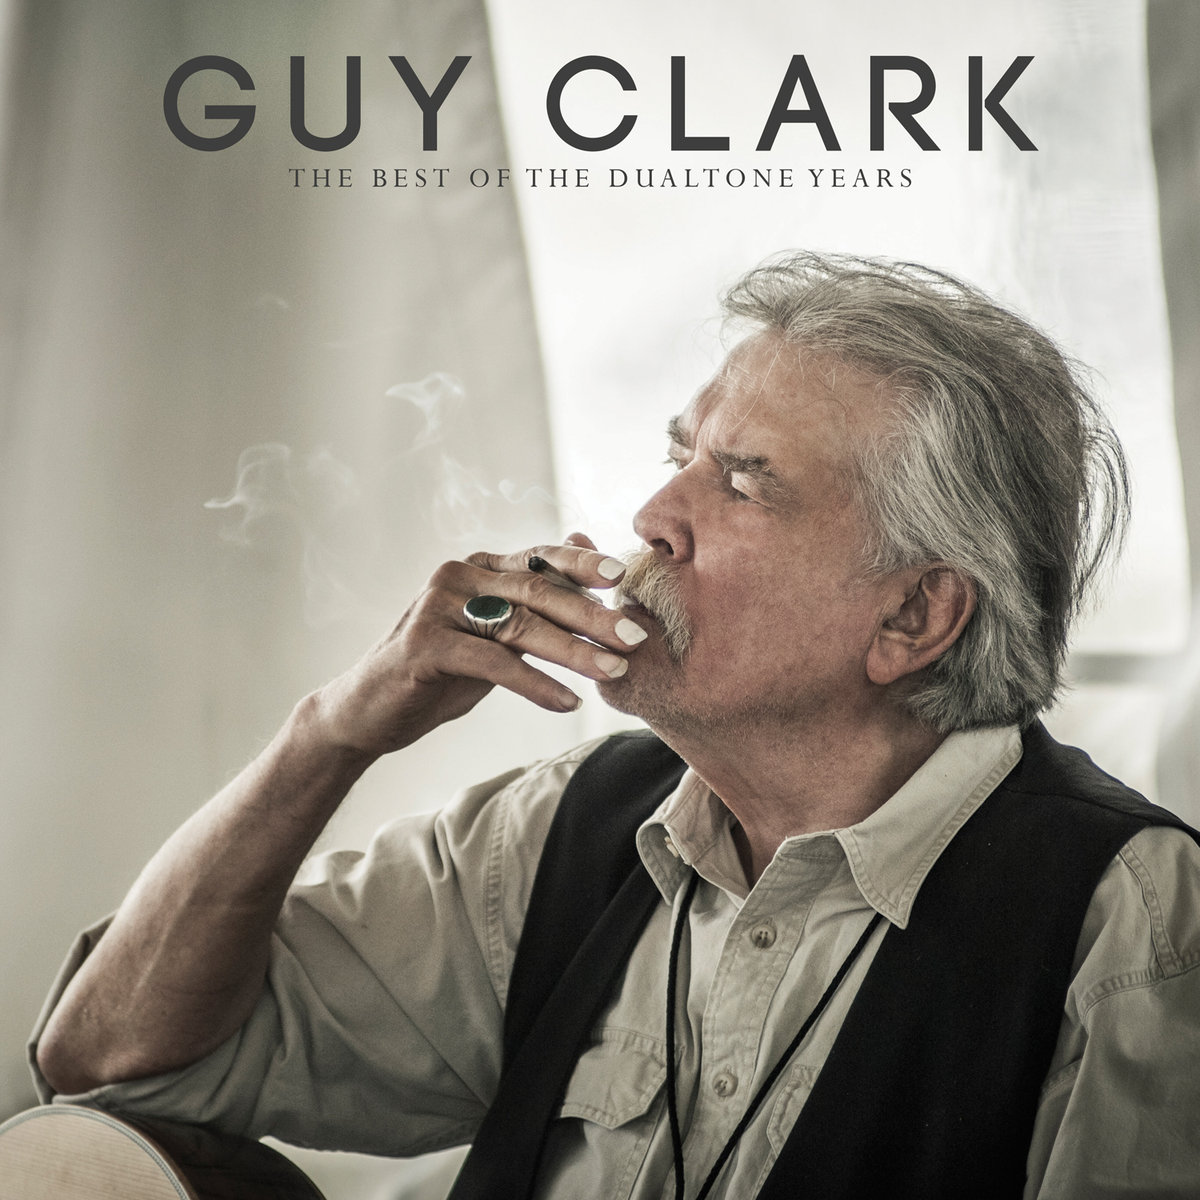 dualtone-years-guy-clark